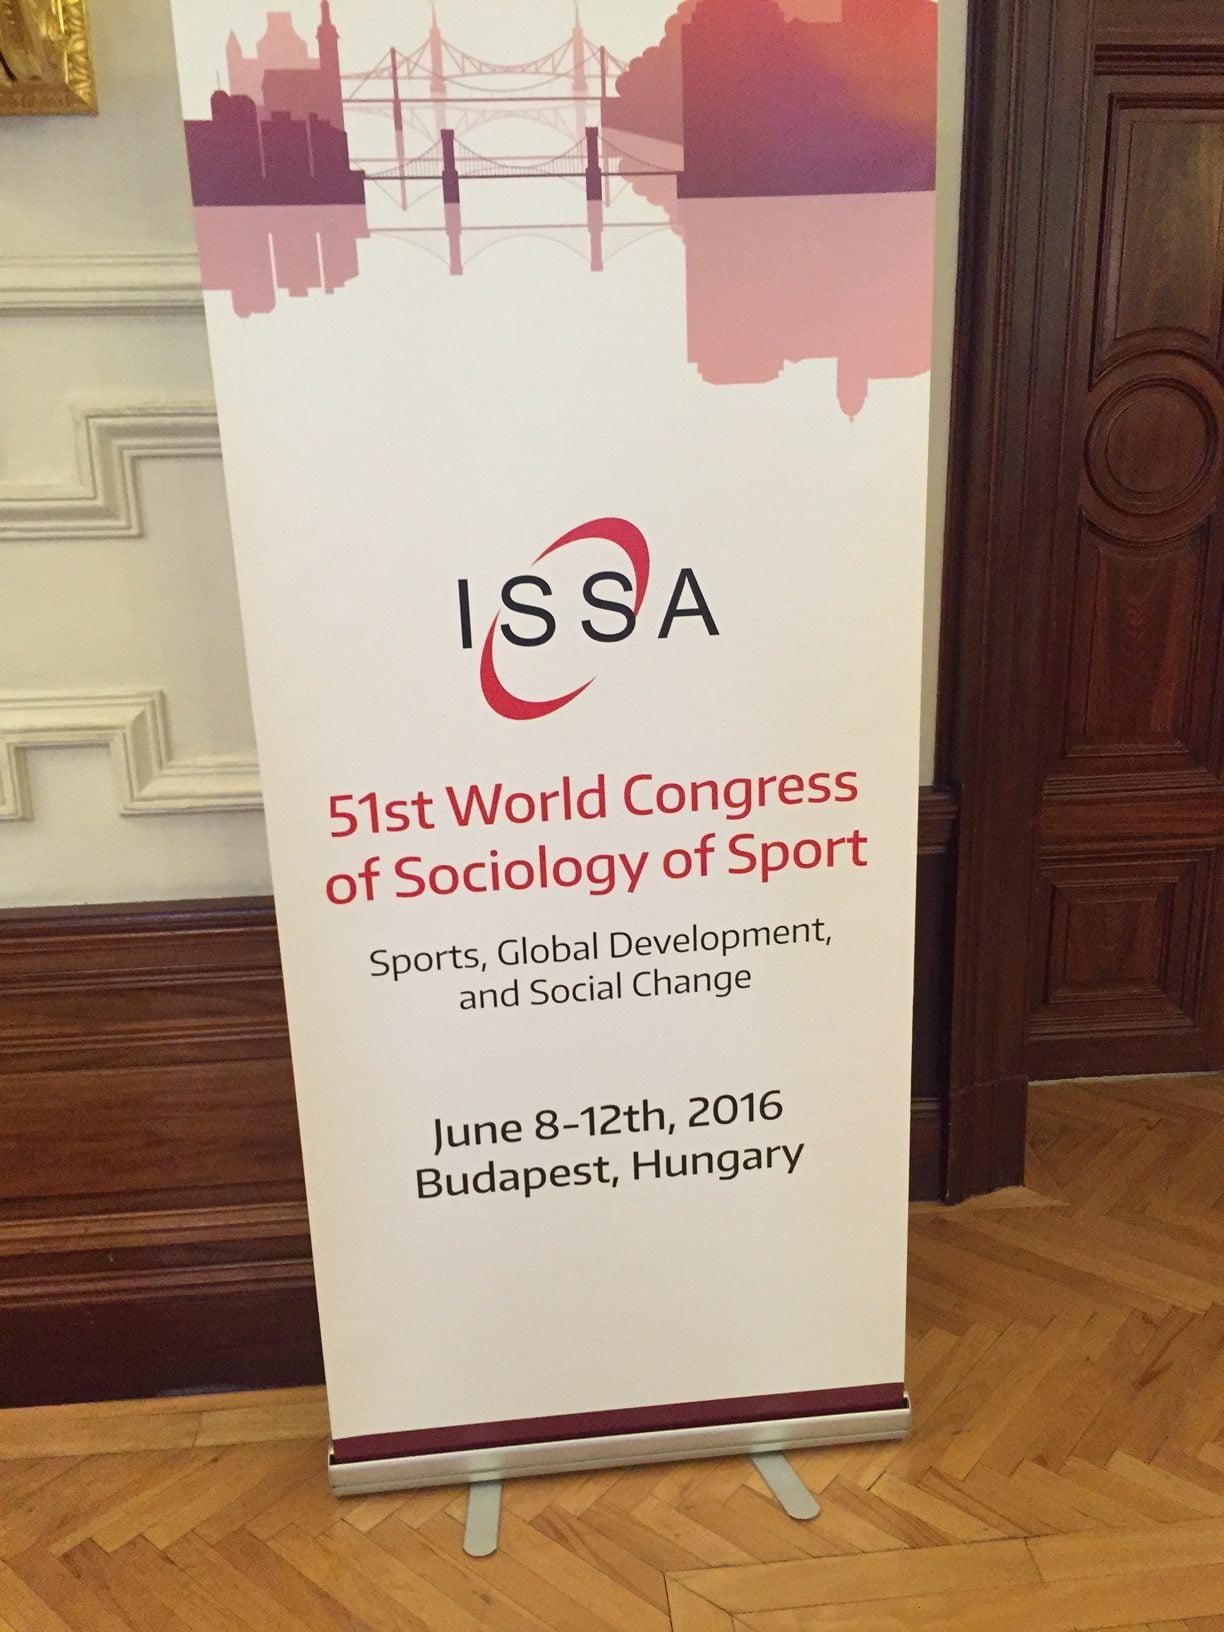 51st World Congress of Sociology of Sport – Sports, Global